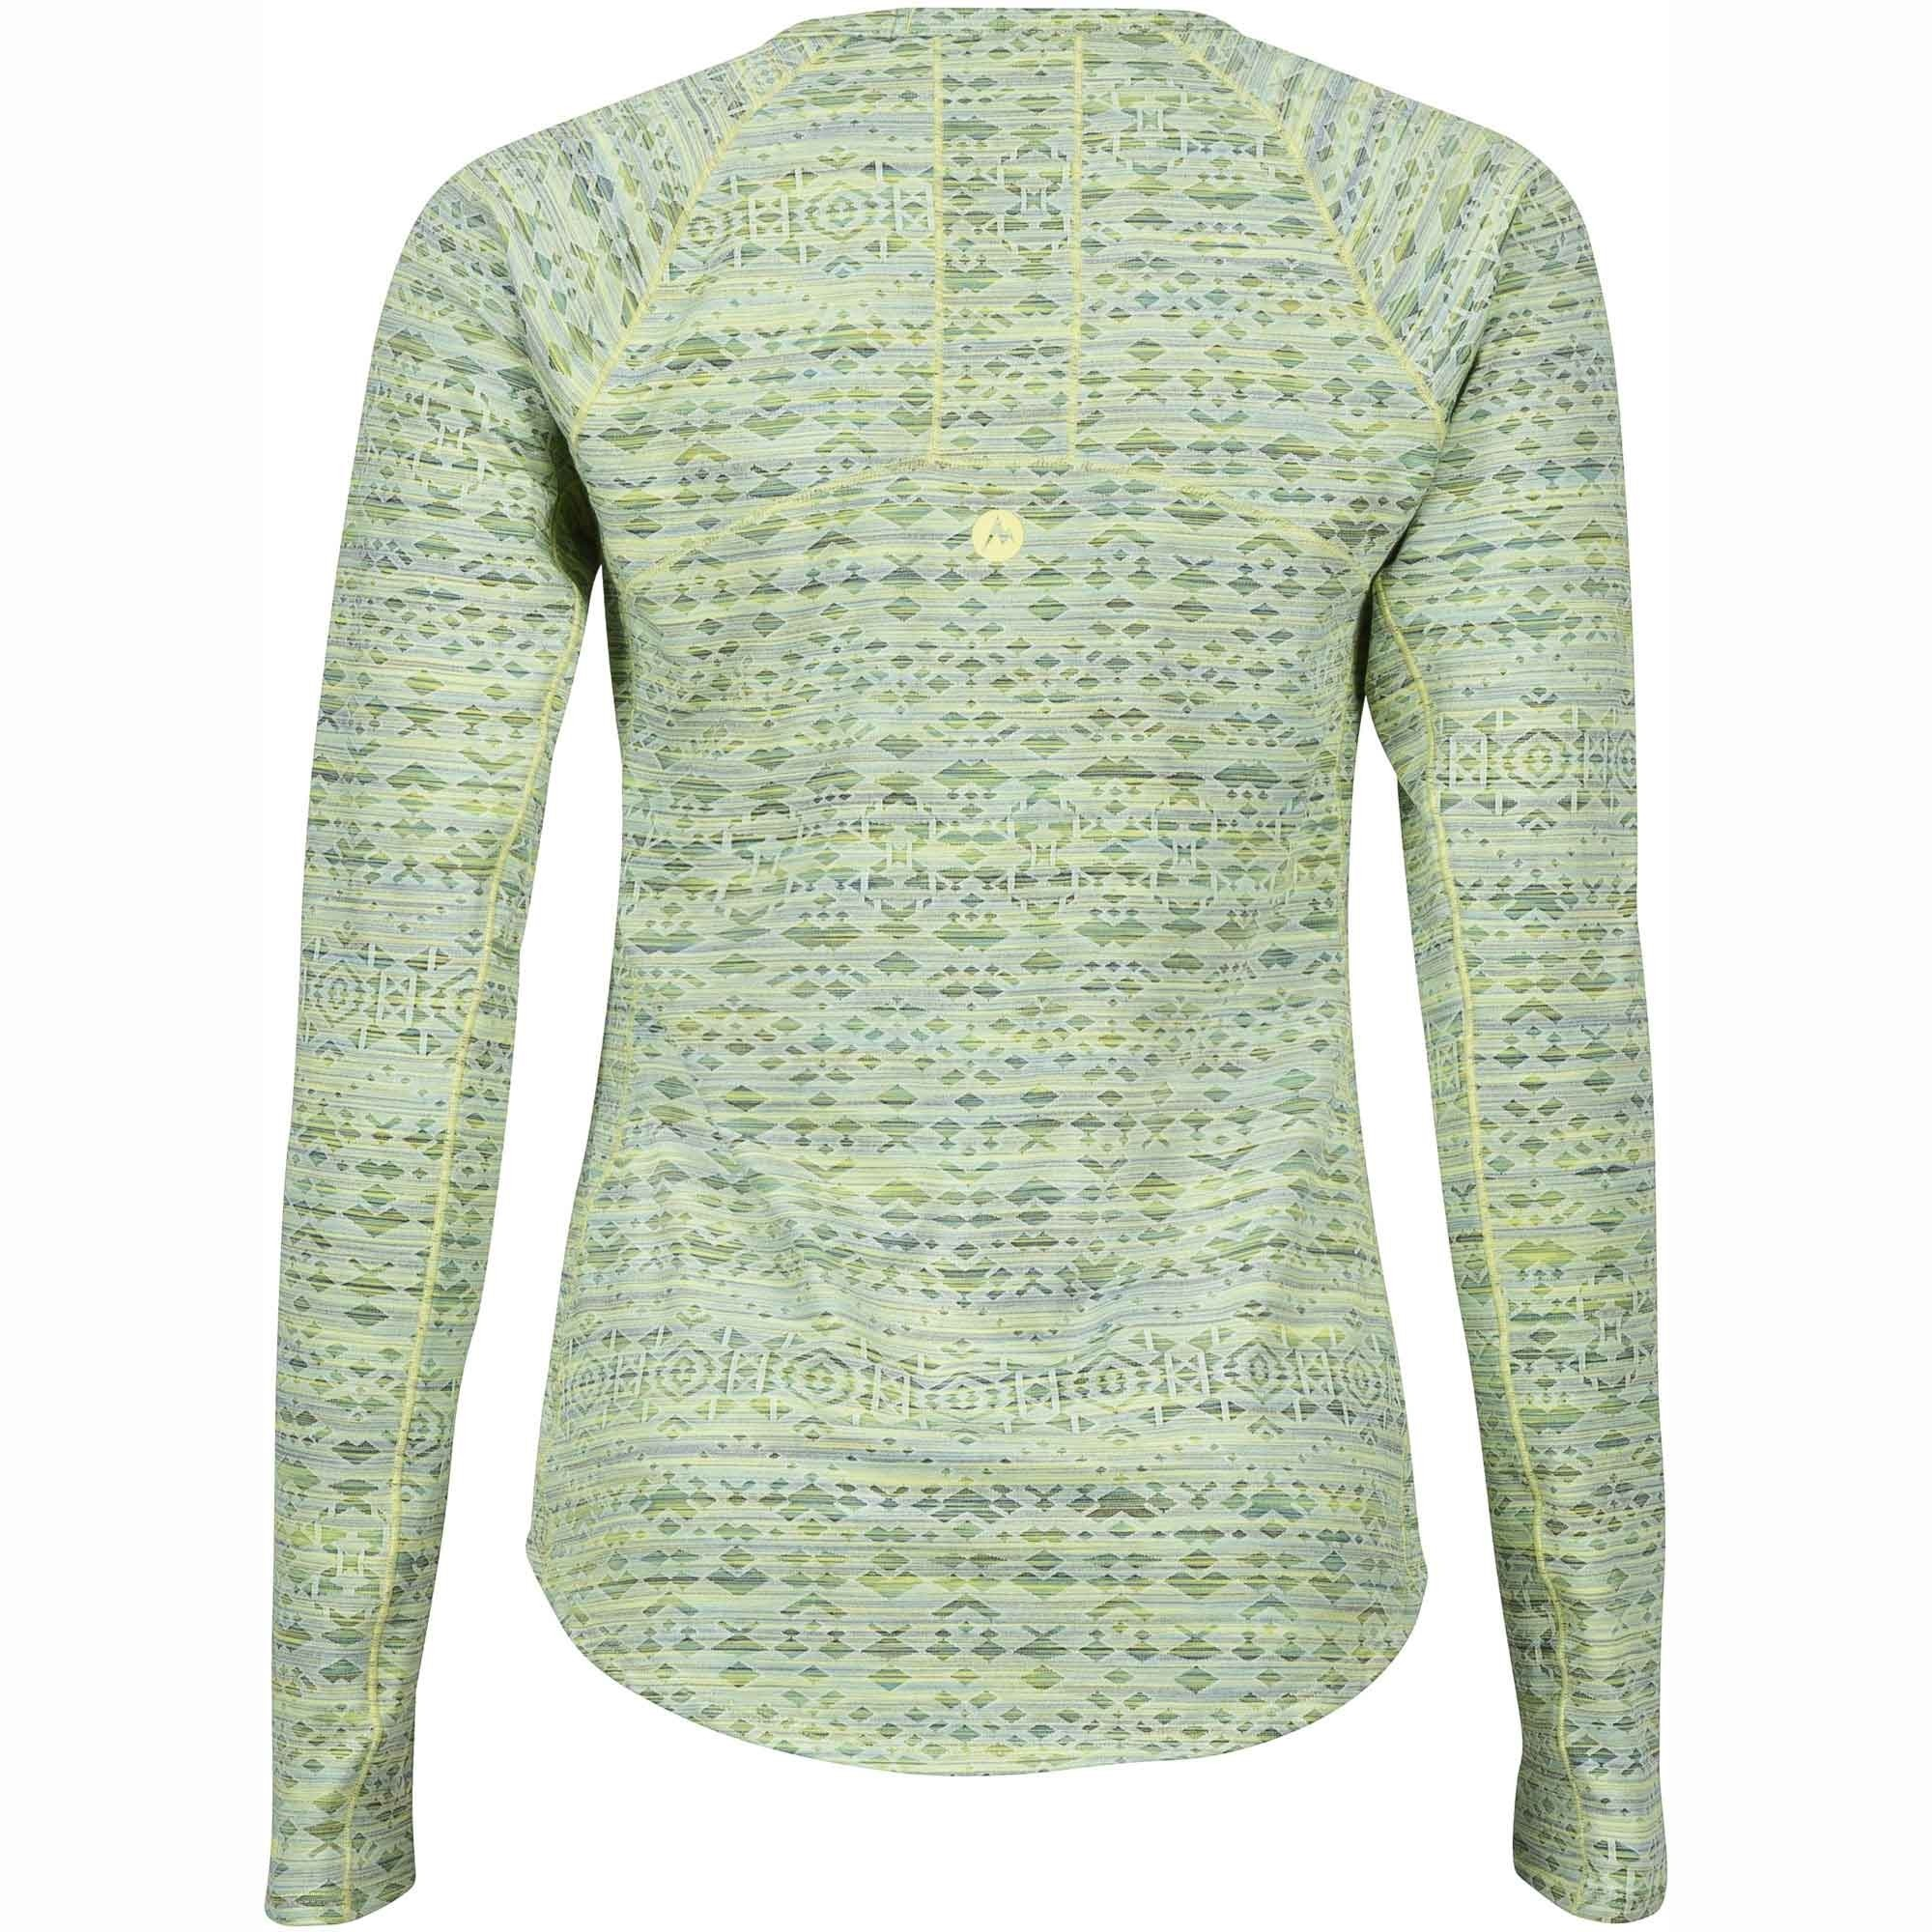 Marmot Sylvie Long Sleeved Top - Honeydew - Back